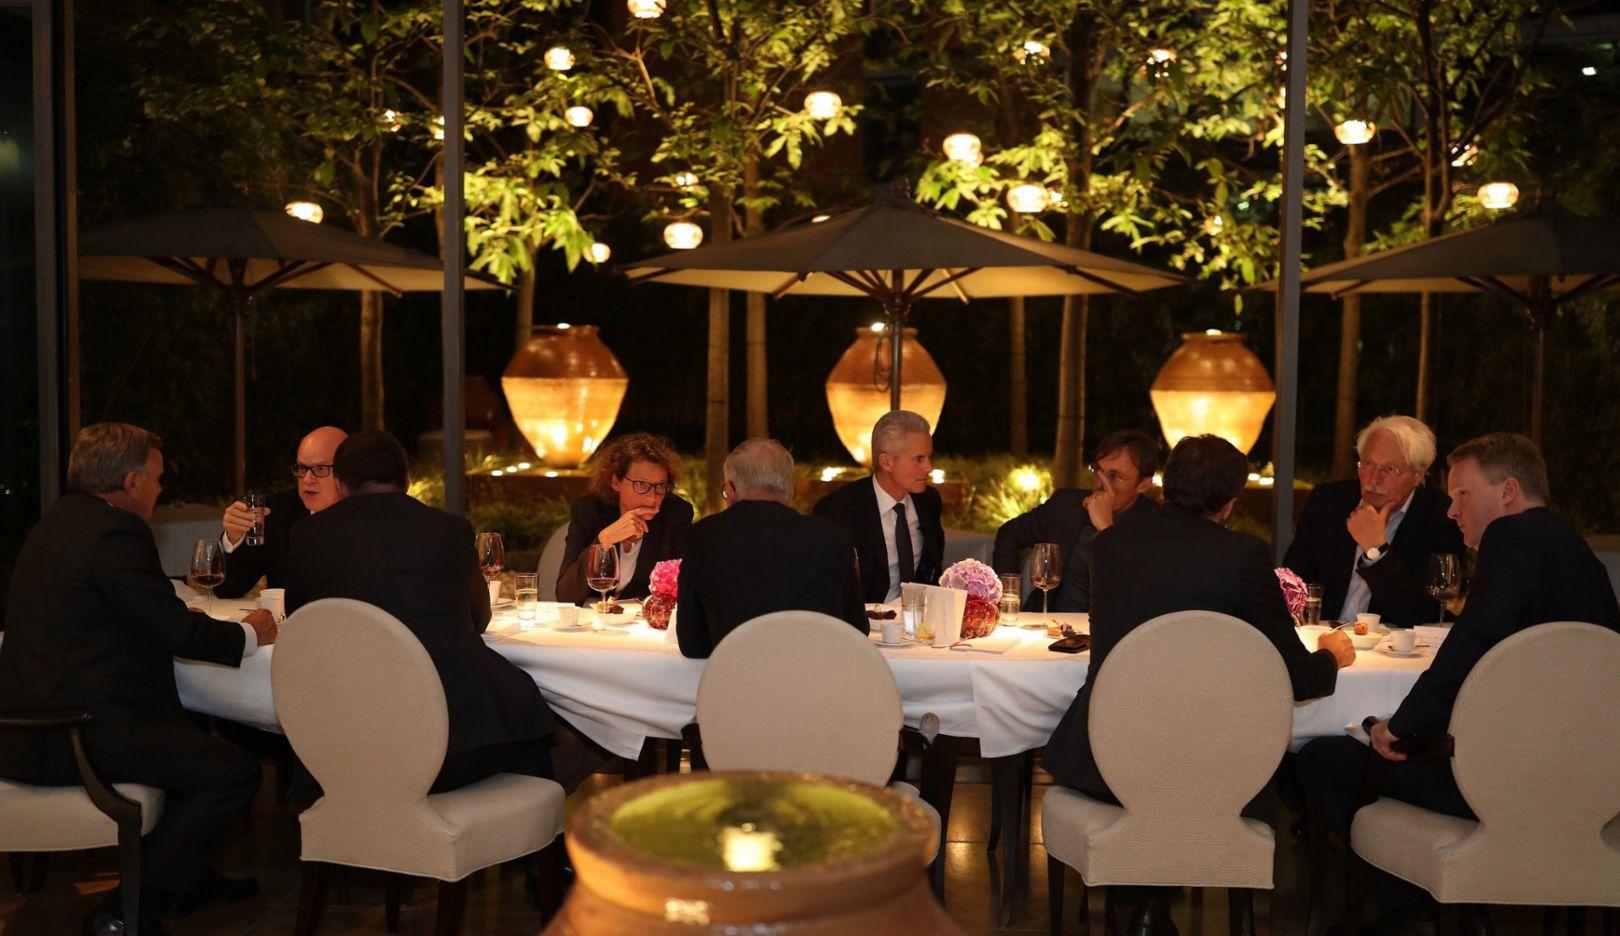 Unternehmer-Dinner, Porsche Consulting, 2017, Porsche AG